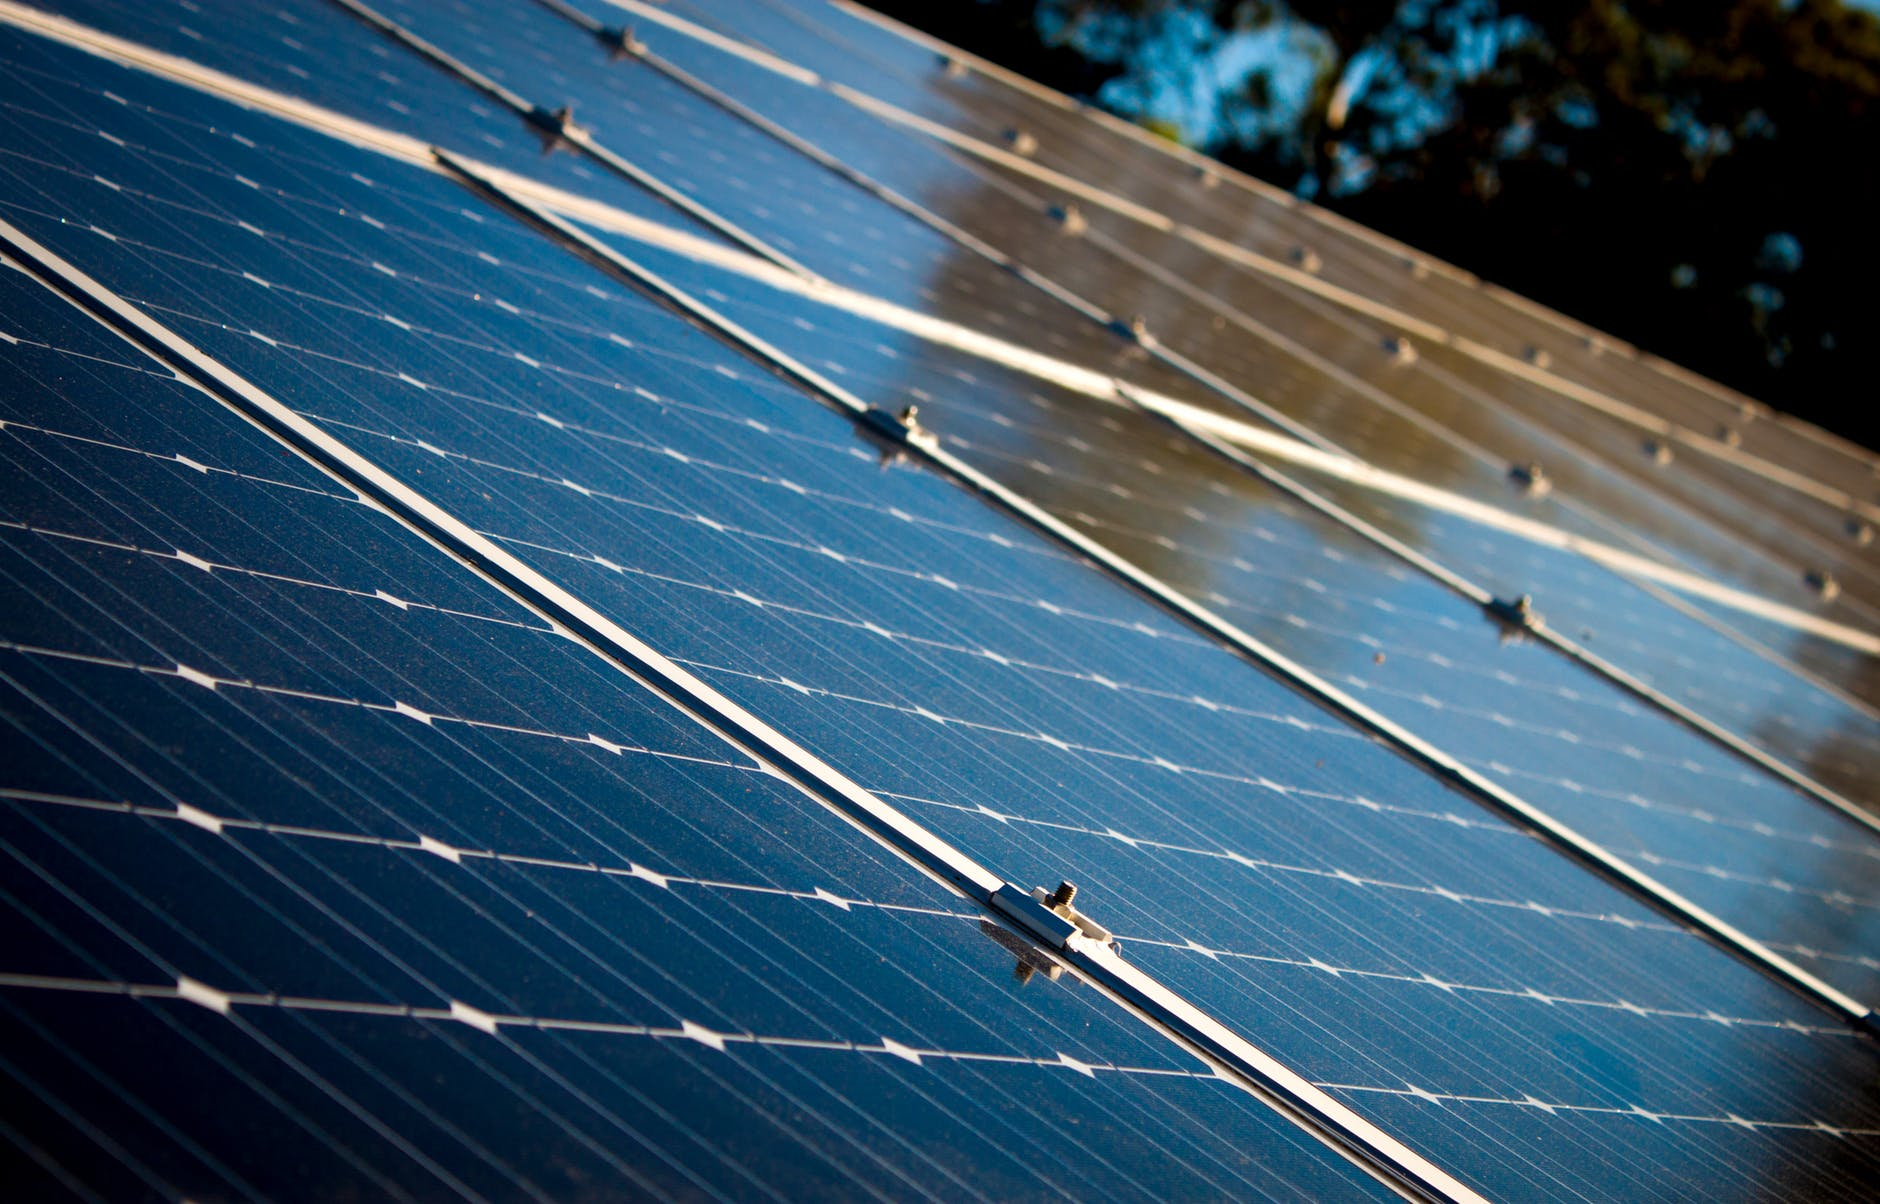 139GW solar